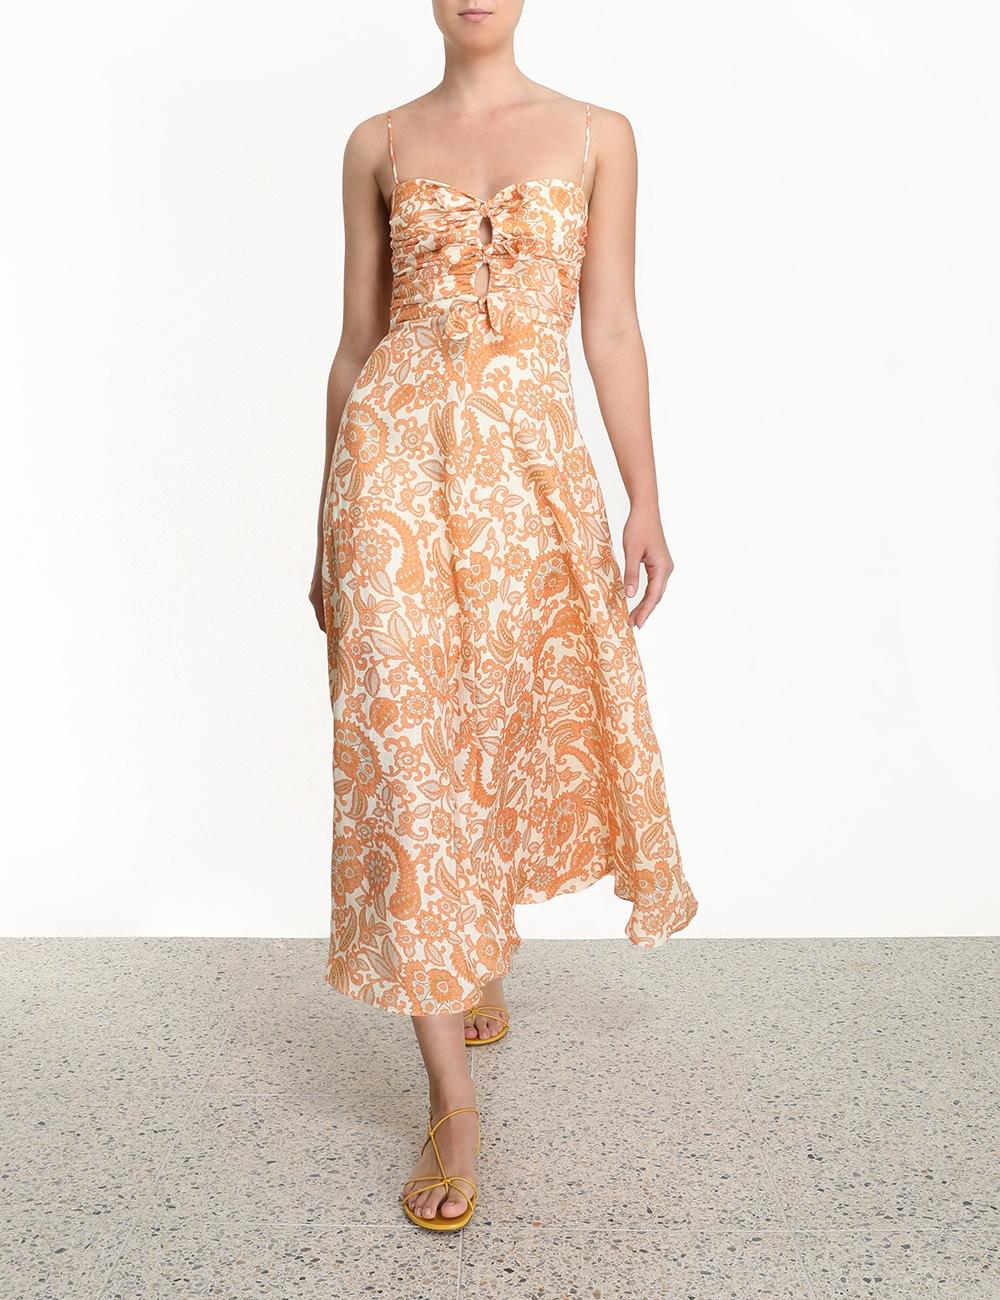 Peggy Tie Dress